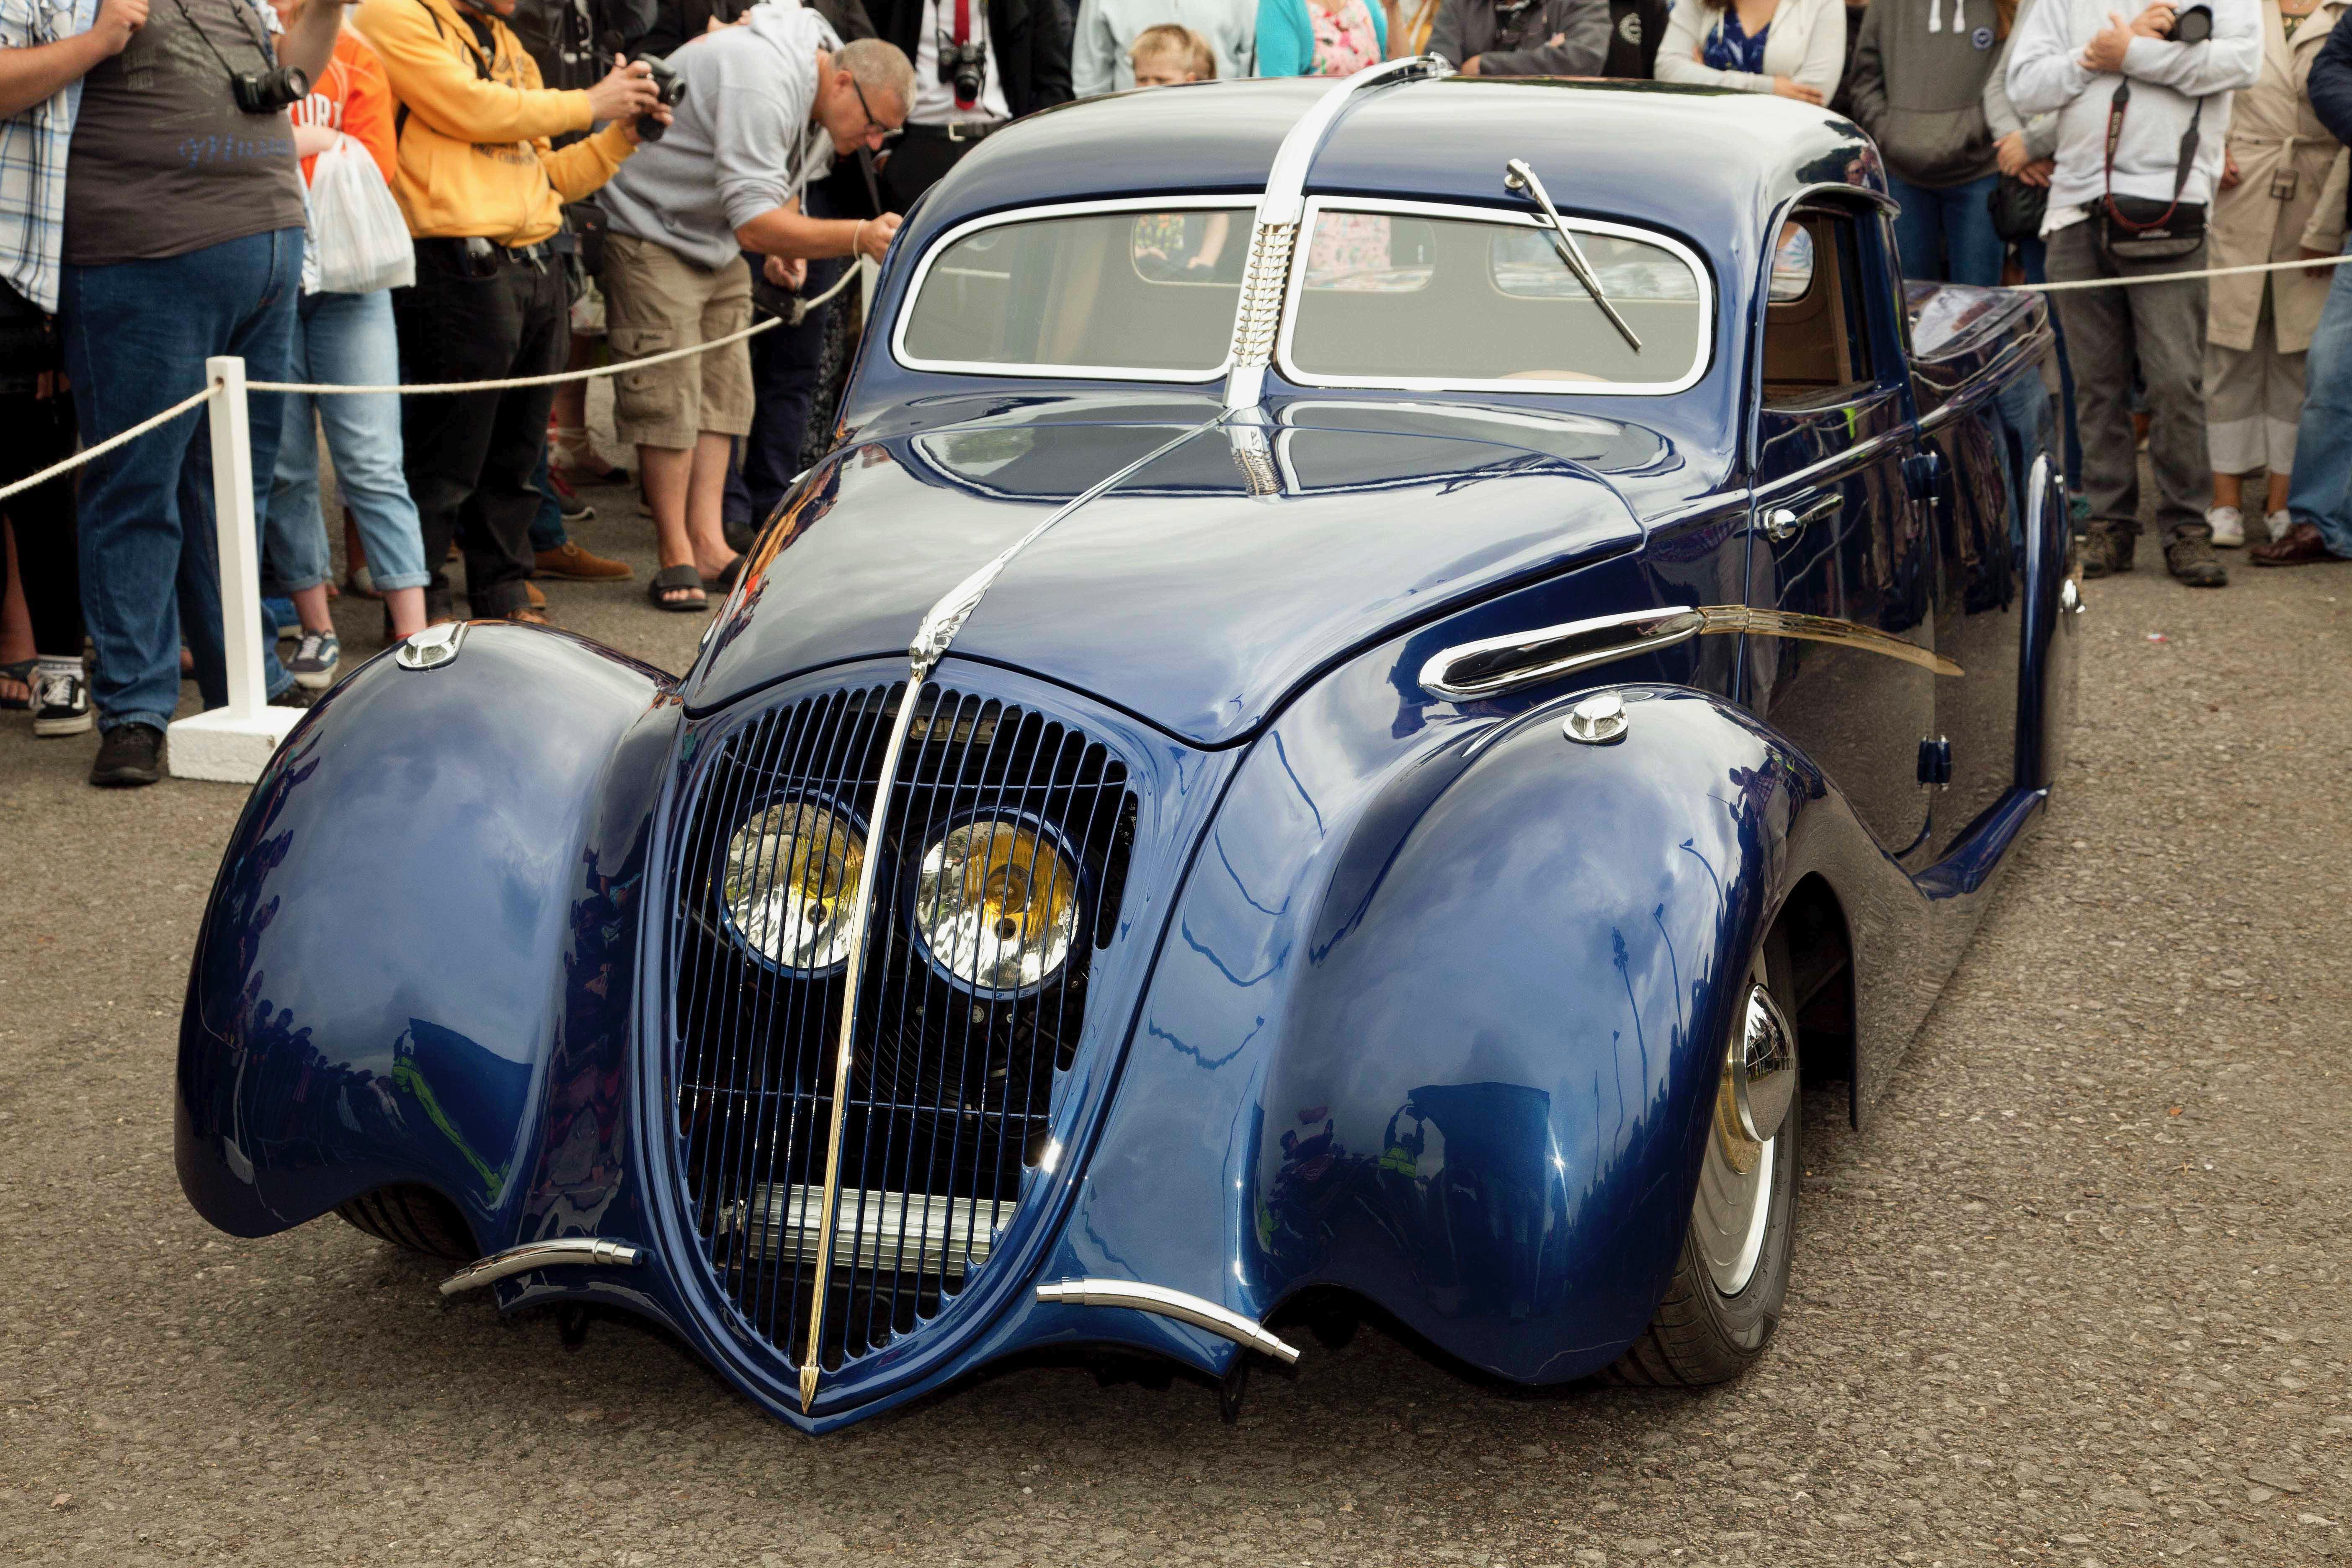 Beaulieu Features Hot Rods And Custom Cars At Summer Exhibit - Saratoga auto museum car show